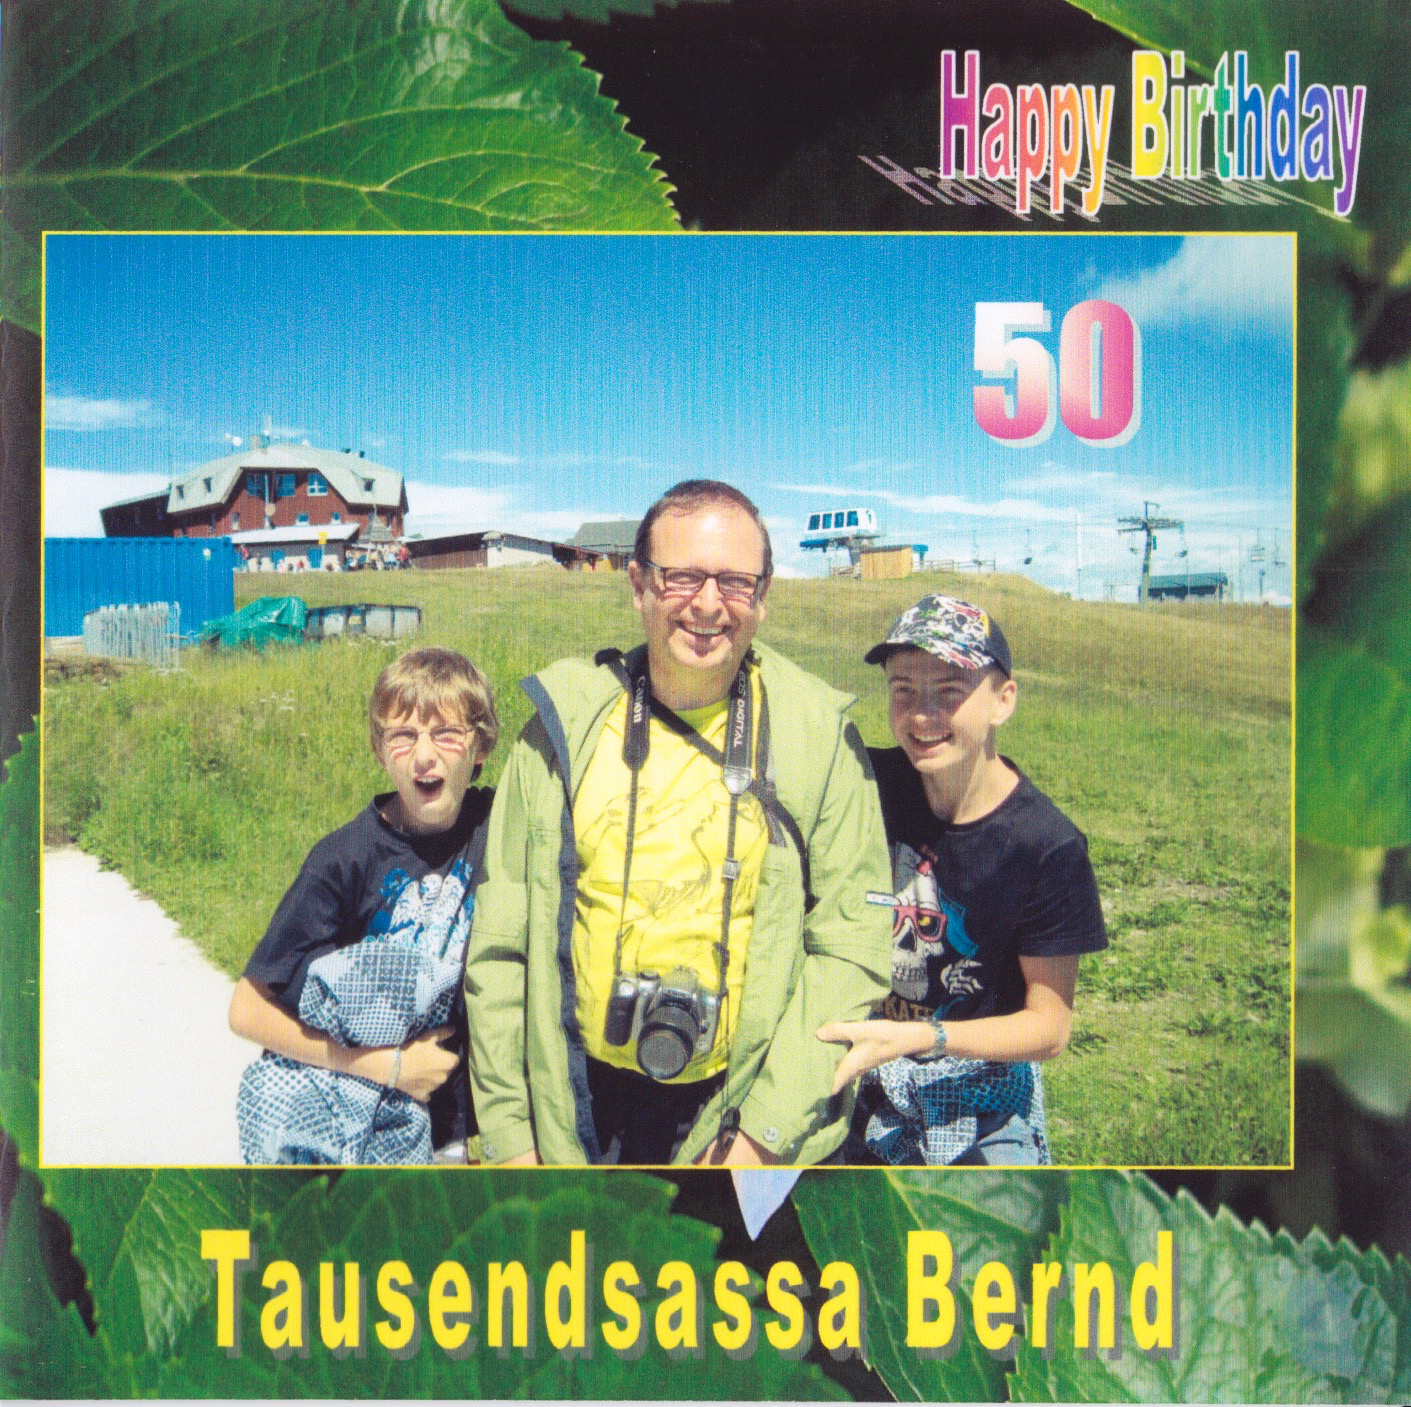 https://0501.nccdn.net/4_2/000/000/079/c81/Tausendsassa-Bernd.jpg